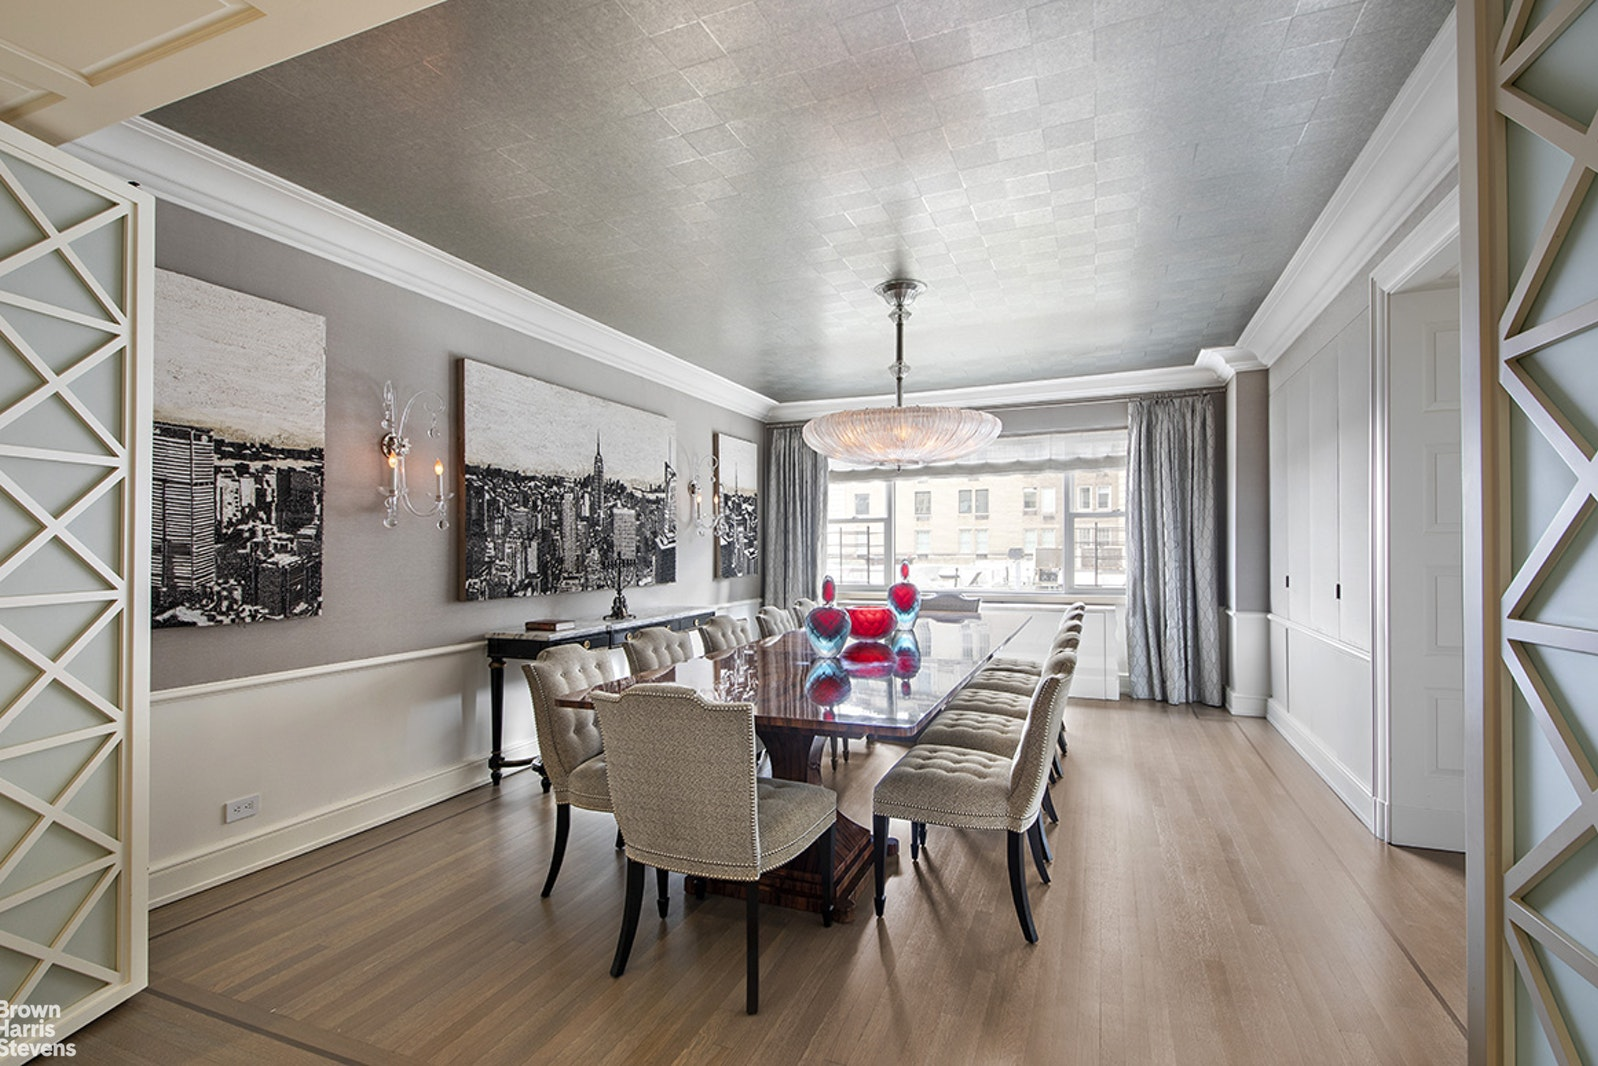 785 FIFTH AVENUE 10/11C, Upper East Side, $8,850,000, Web #: 20280338